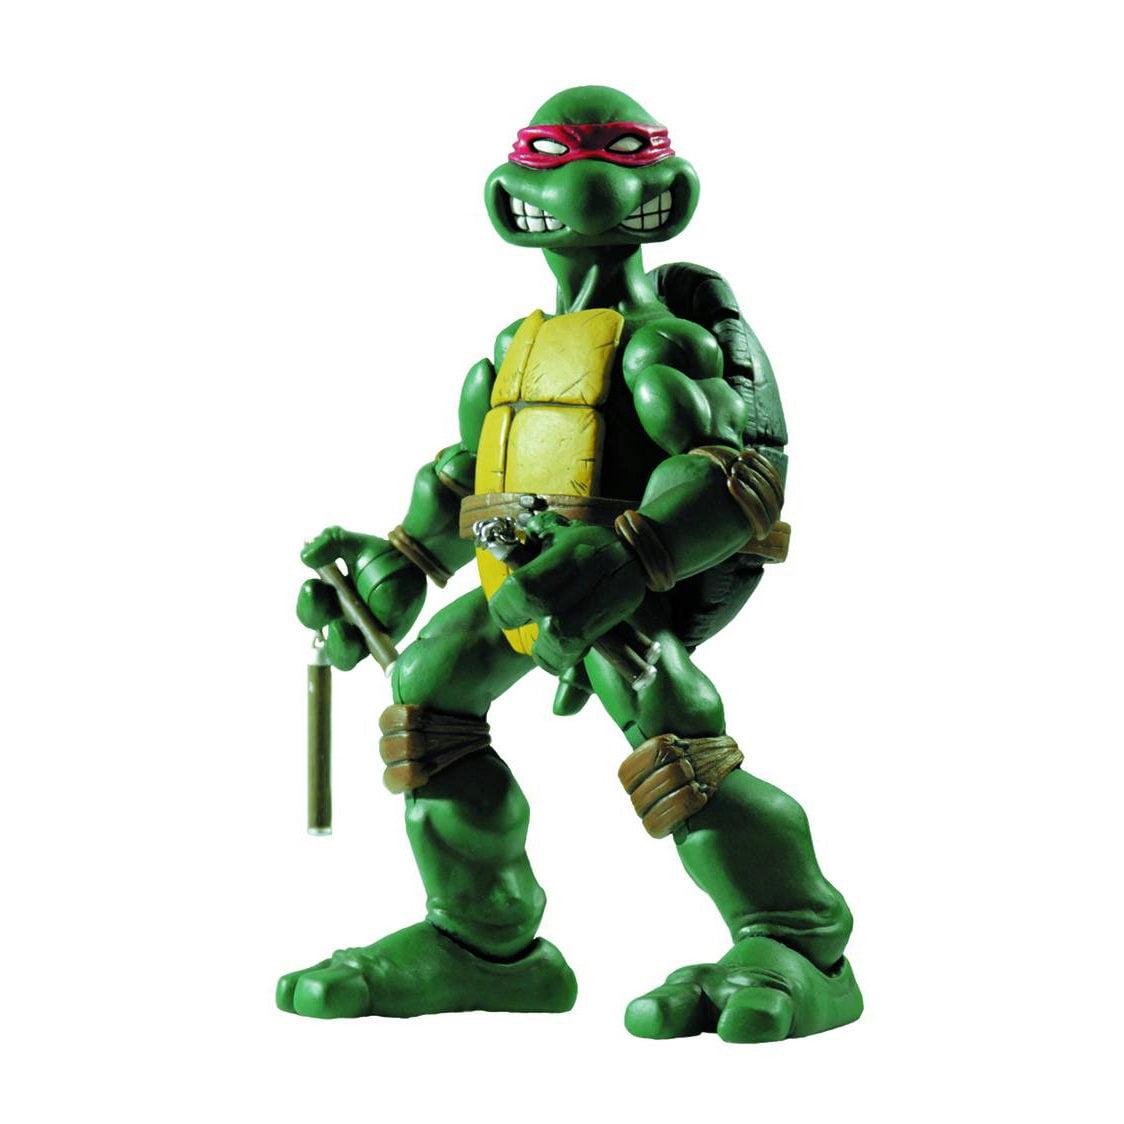 Teenage Mutant Ninja Turtles Michelangelo 1/6 Scale Action Figure